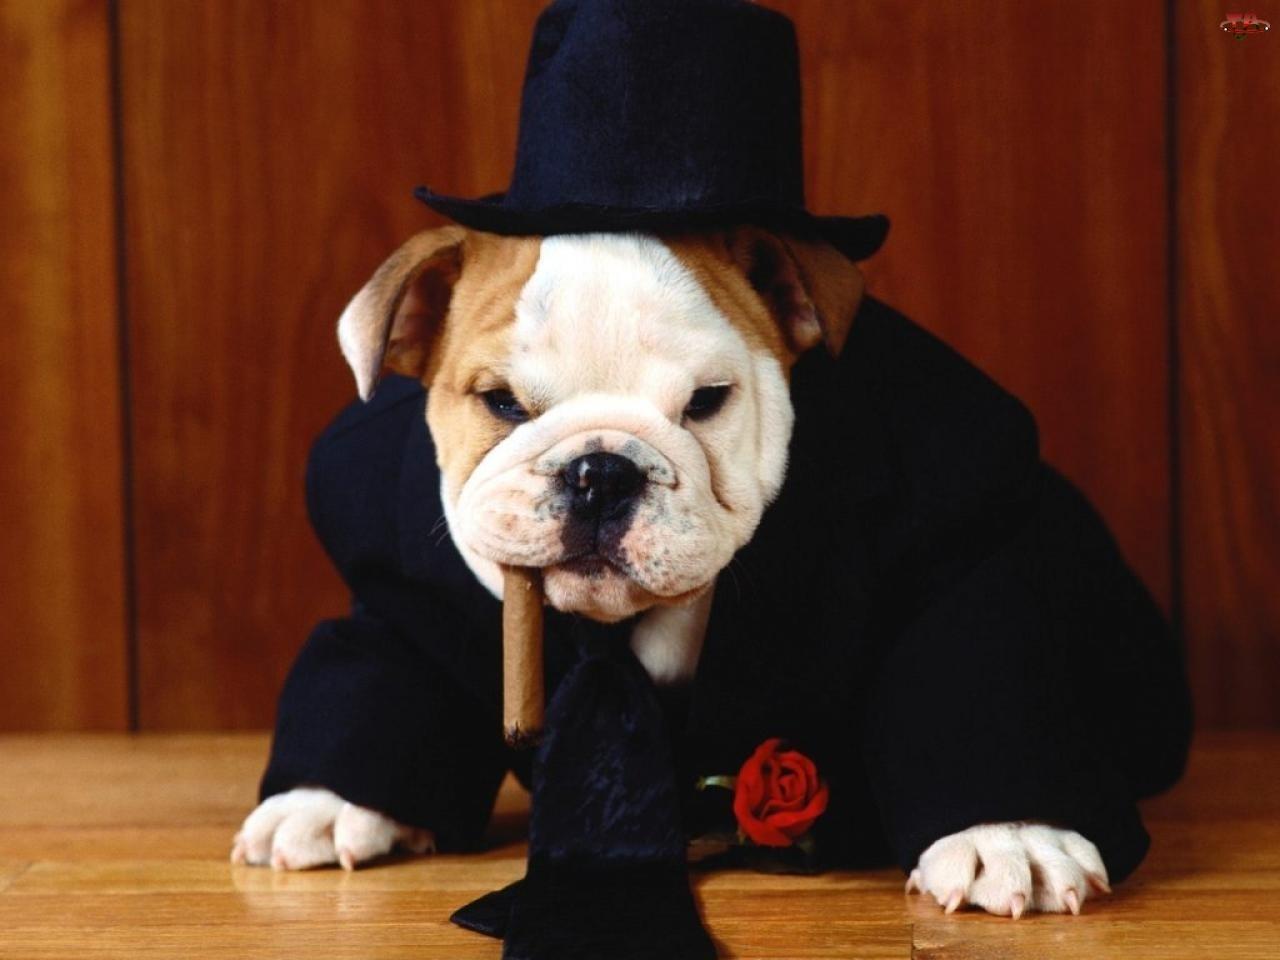 Pies, Krawat, Kapelusz, Cygaro